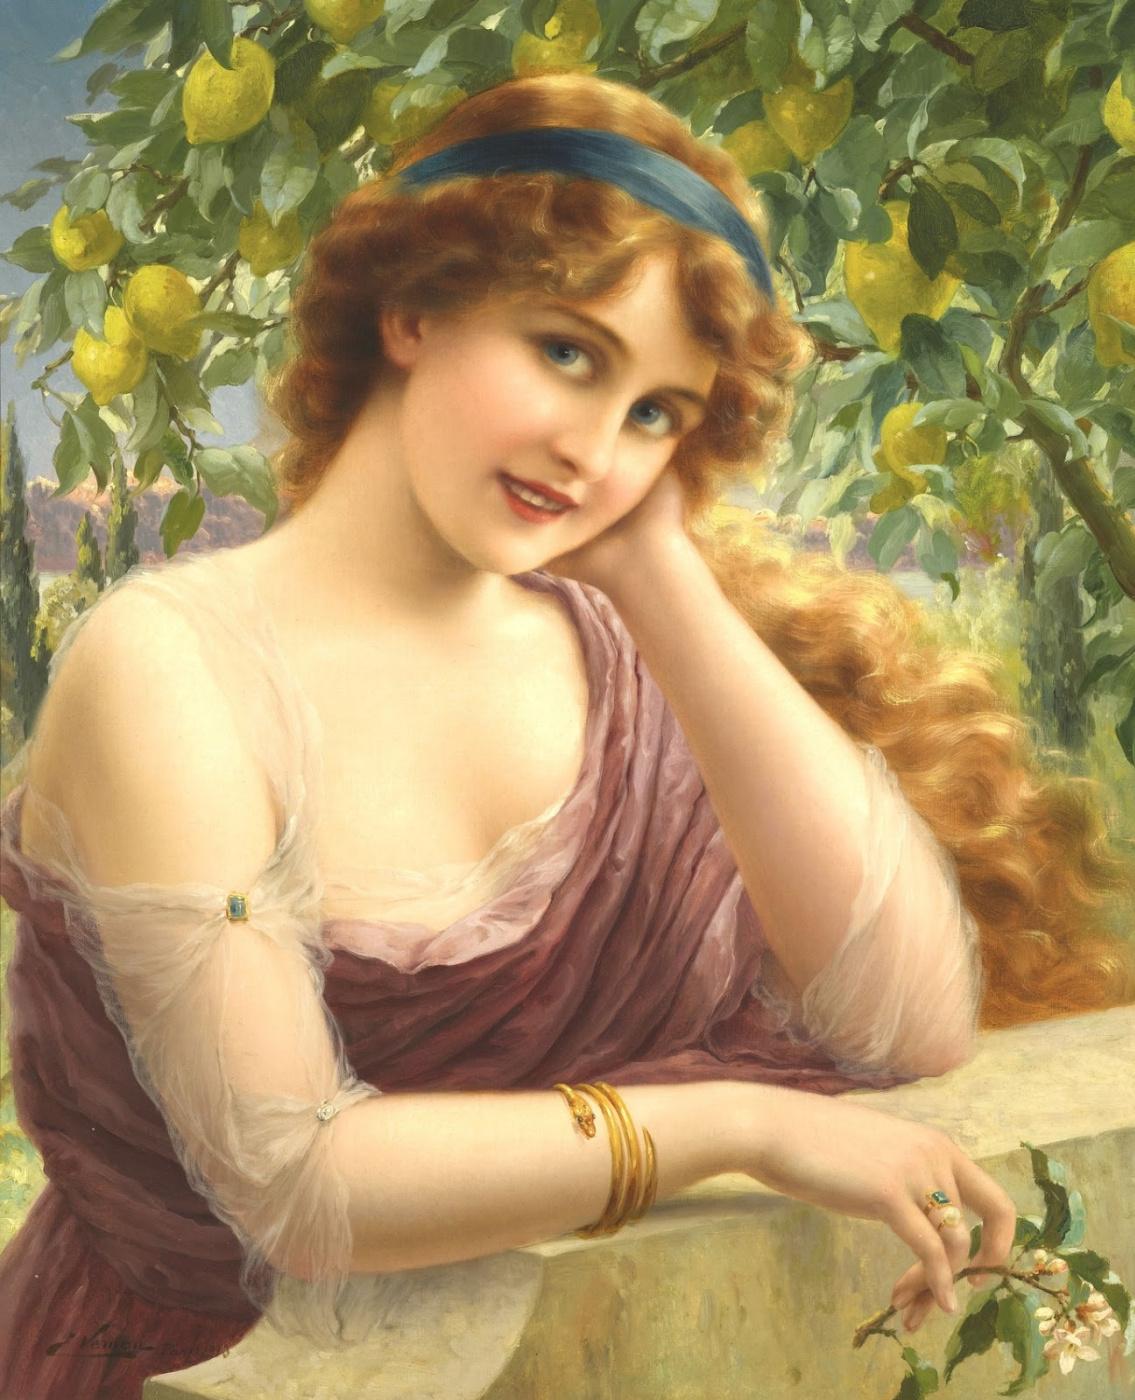 Emile Vernon. Beauty at the lemon tree. 1913